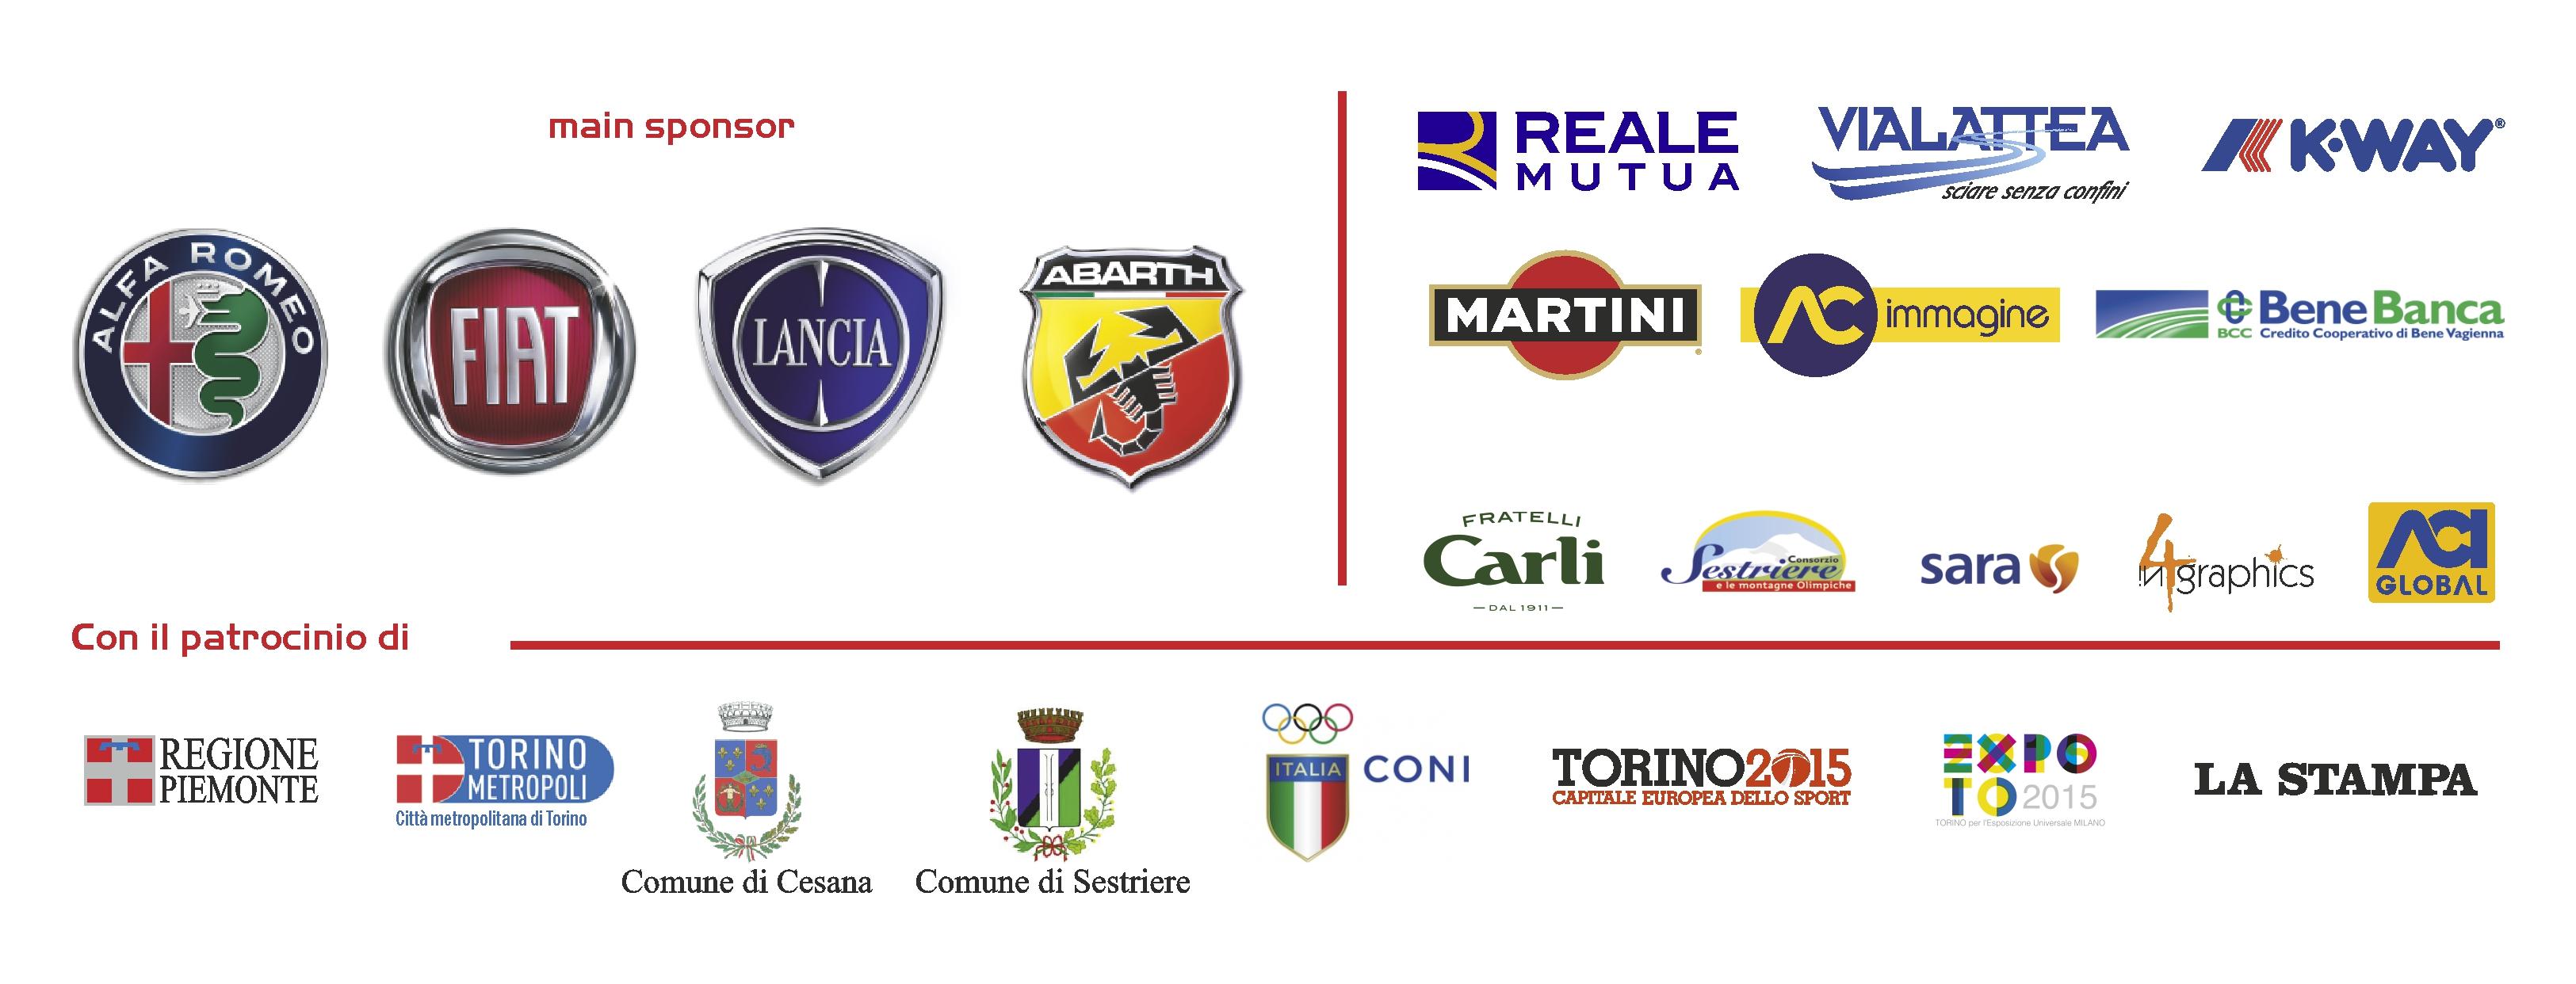 Piedino sponsor 2015